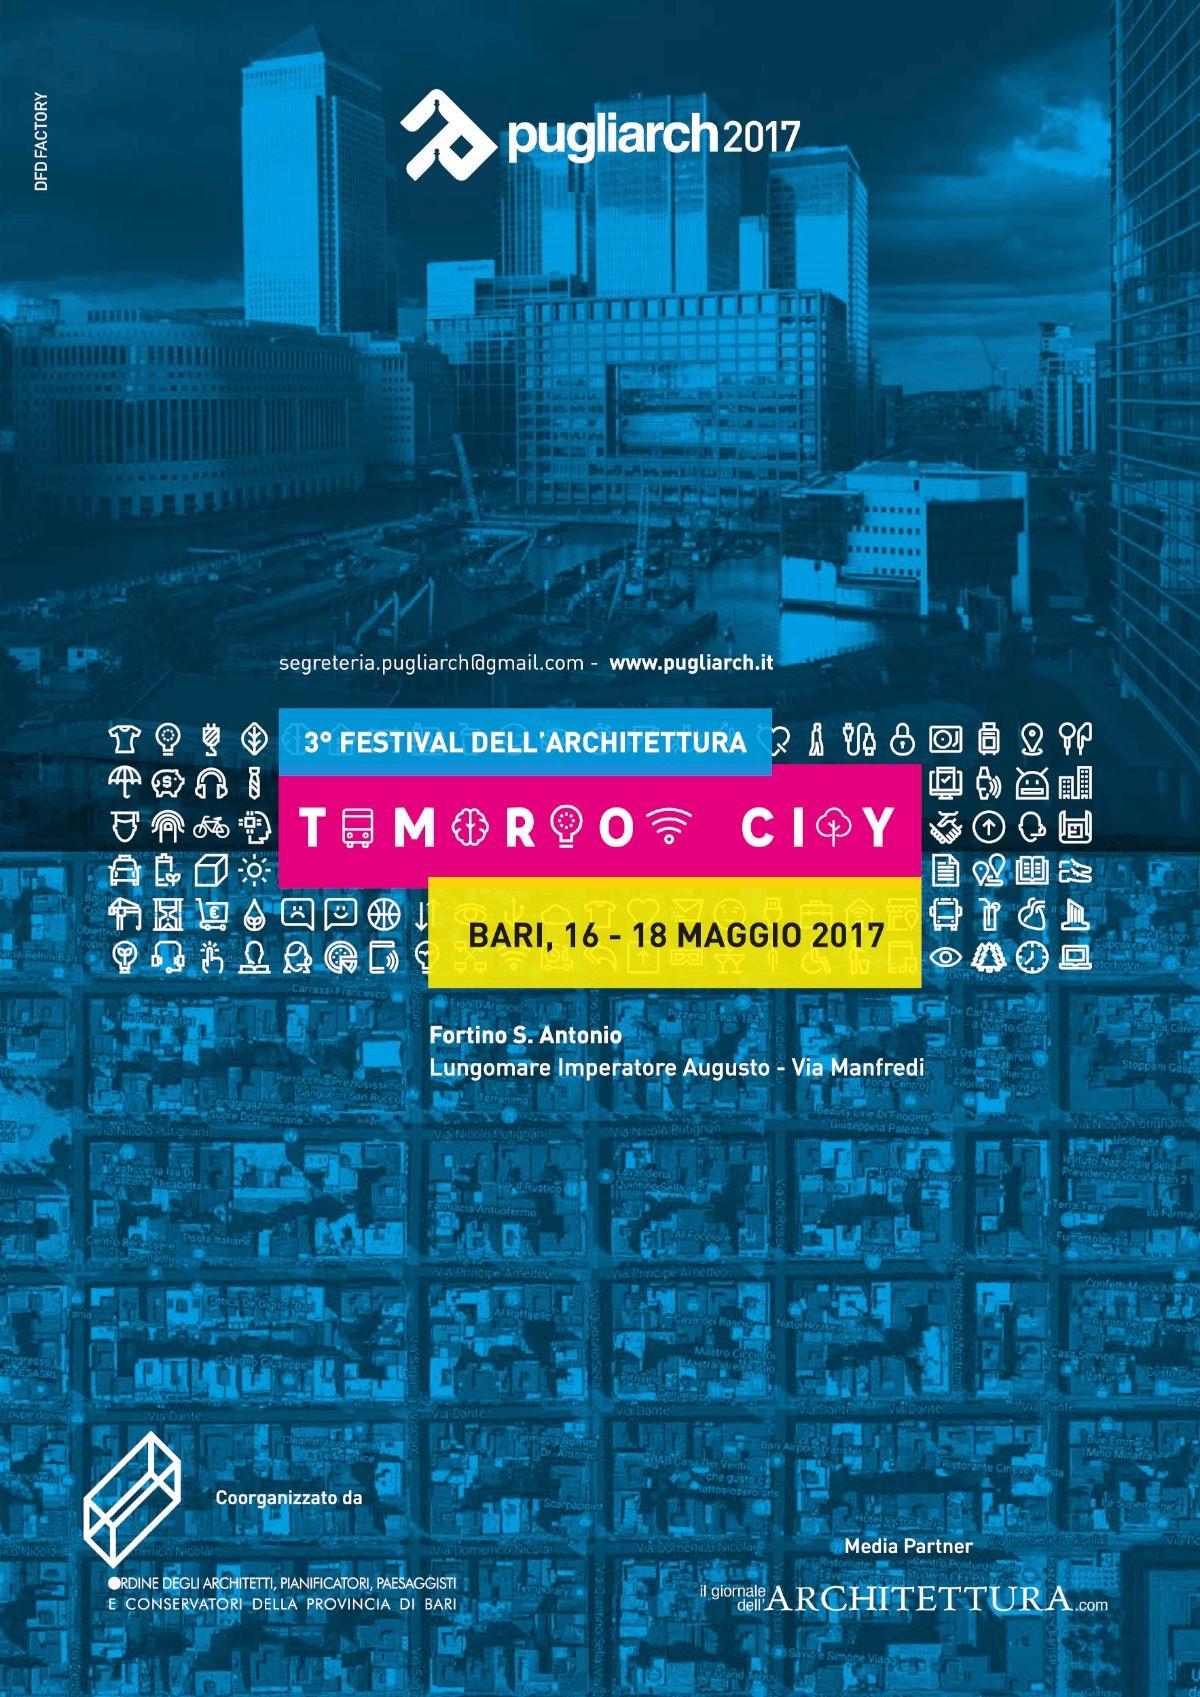 PUGLIARCH 2017-TOMORROW CITY